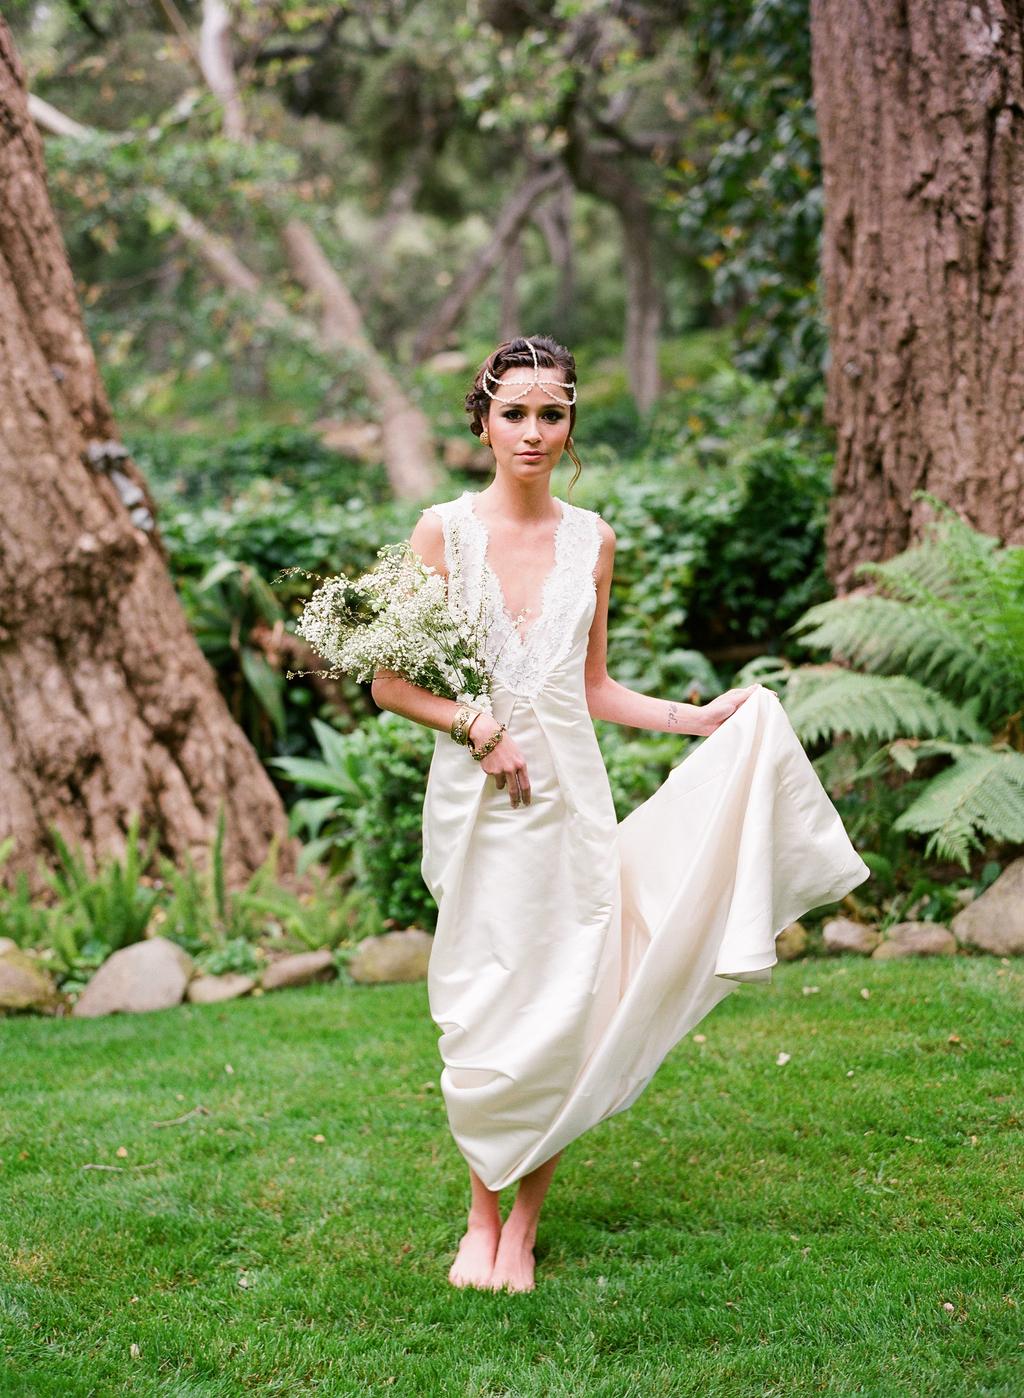 Styled-wedding-santa-barbara-chic-beaux-arts-photographie-italian-bohemian-wedding-bride-wedding-dress-lace-white-flowers-bouquet-048.full